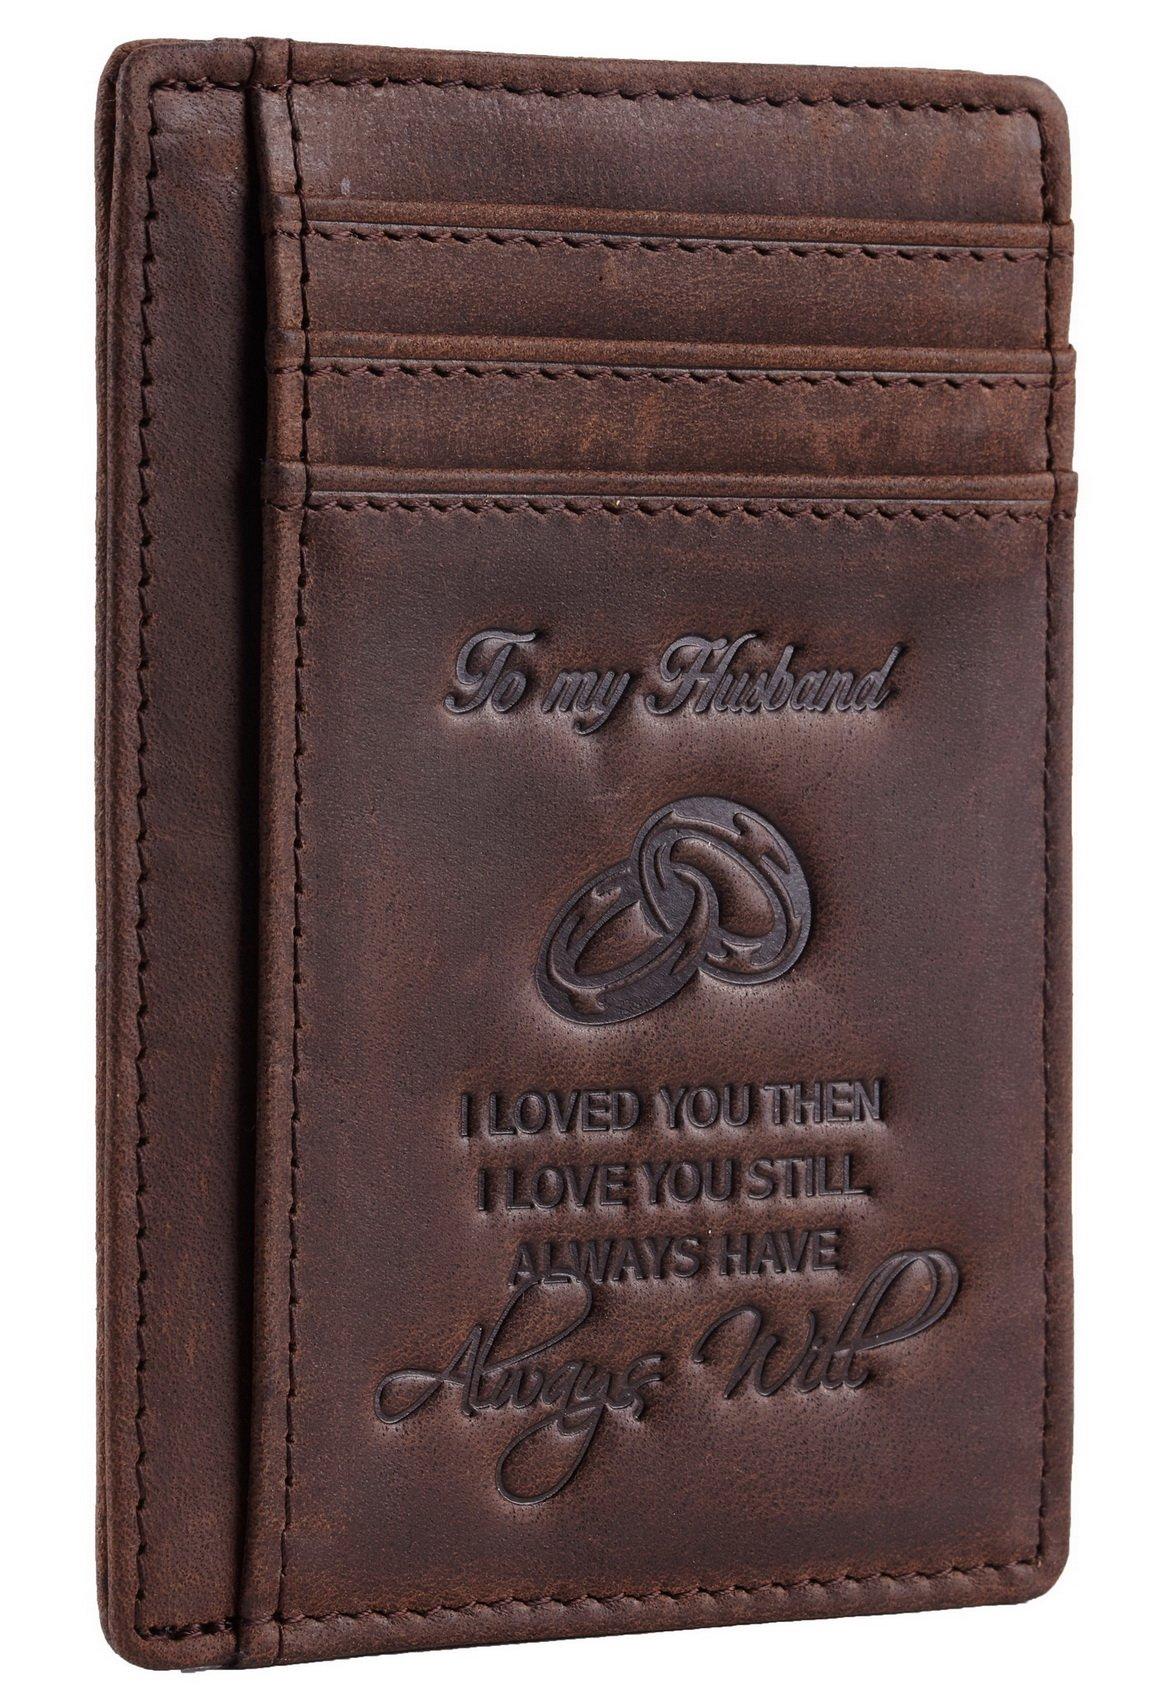 NapaWalli Wife To Husband Gift Best Anniversary Birthday Gifts For Him Genuine Leather RFID Blocking slim Wallet Card Holder (Hunter Coffee) by NapaWalli (Image #3)